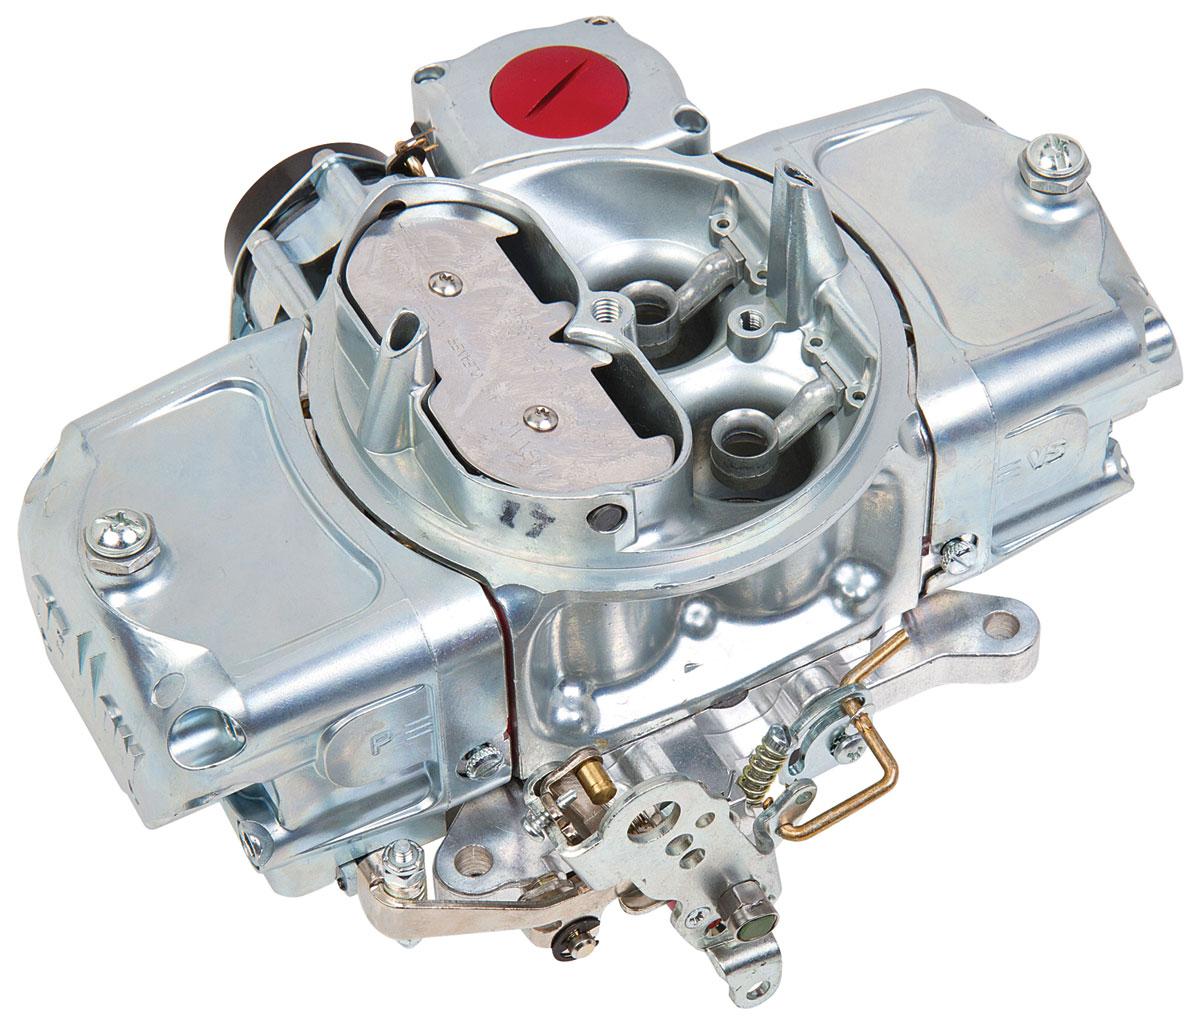 Photo of Carburetors, Speed Demon Vacuum Secondary 750 CFM, no choke